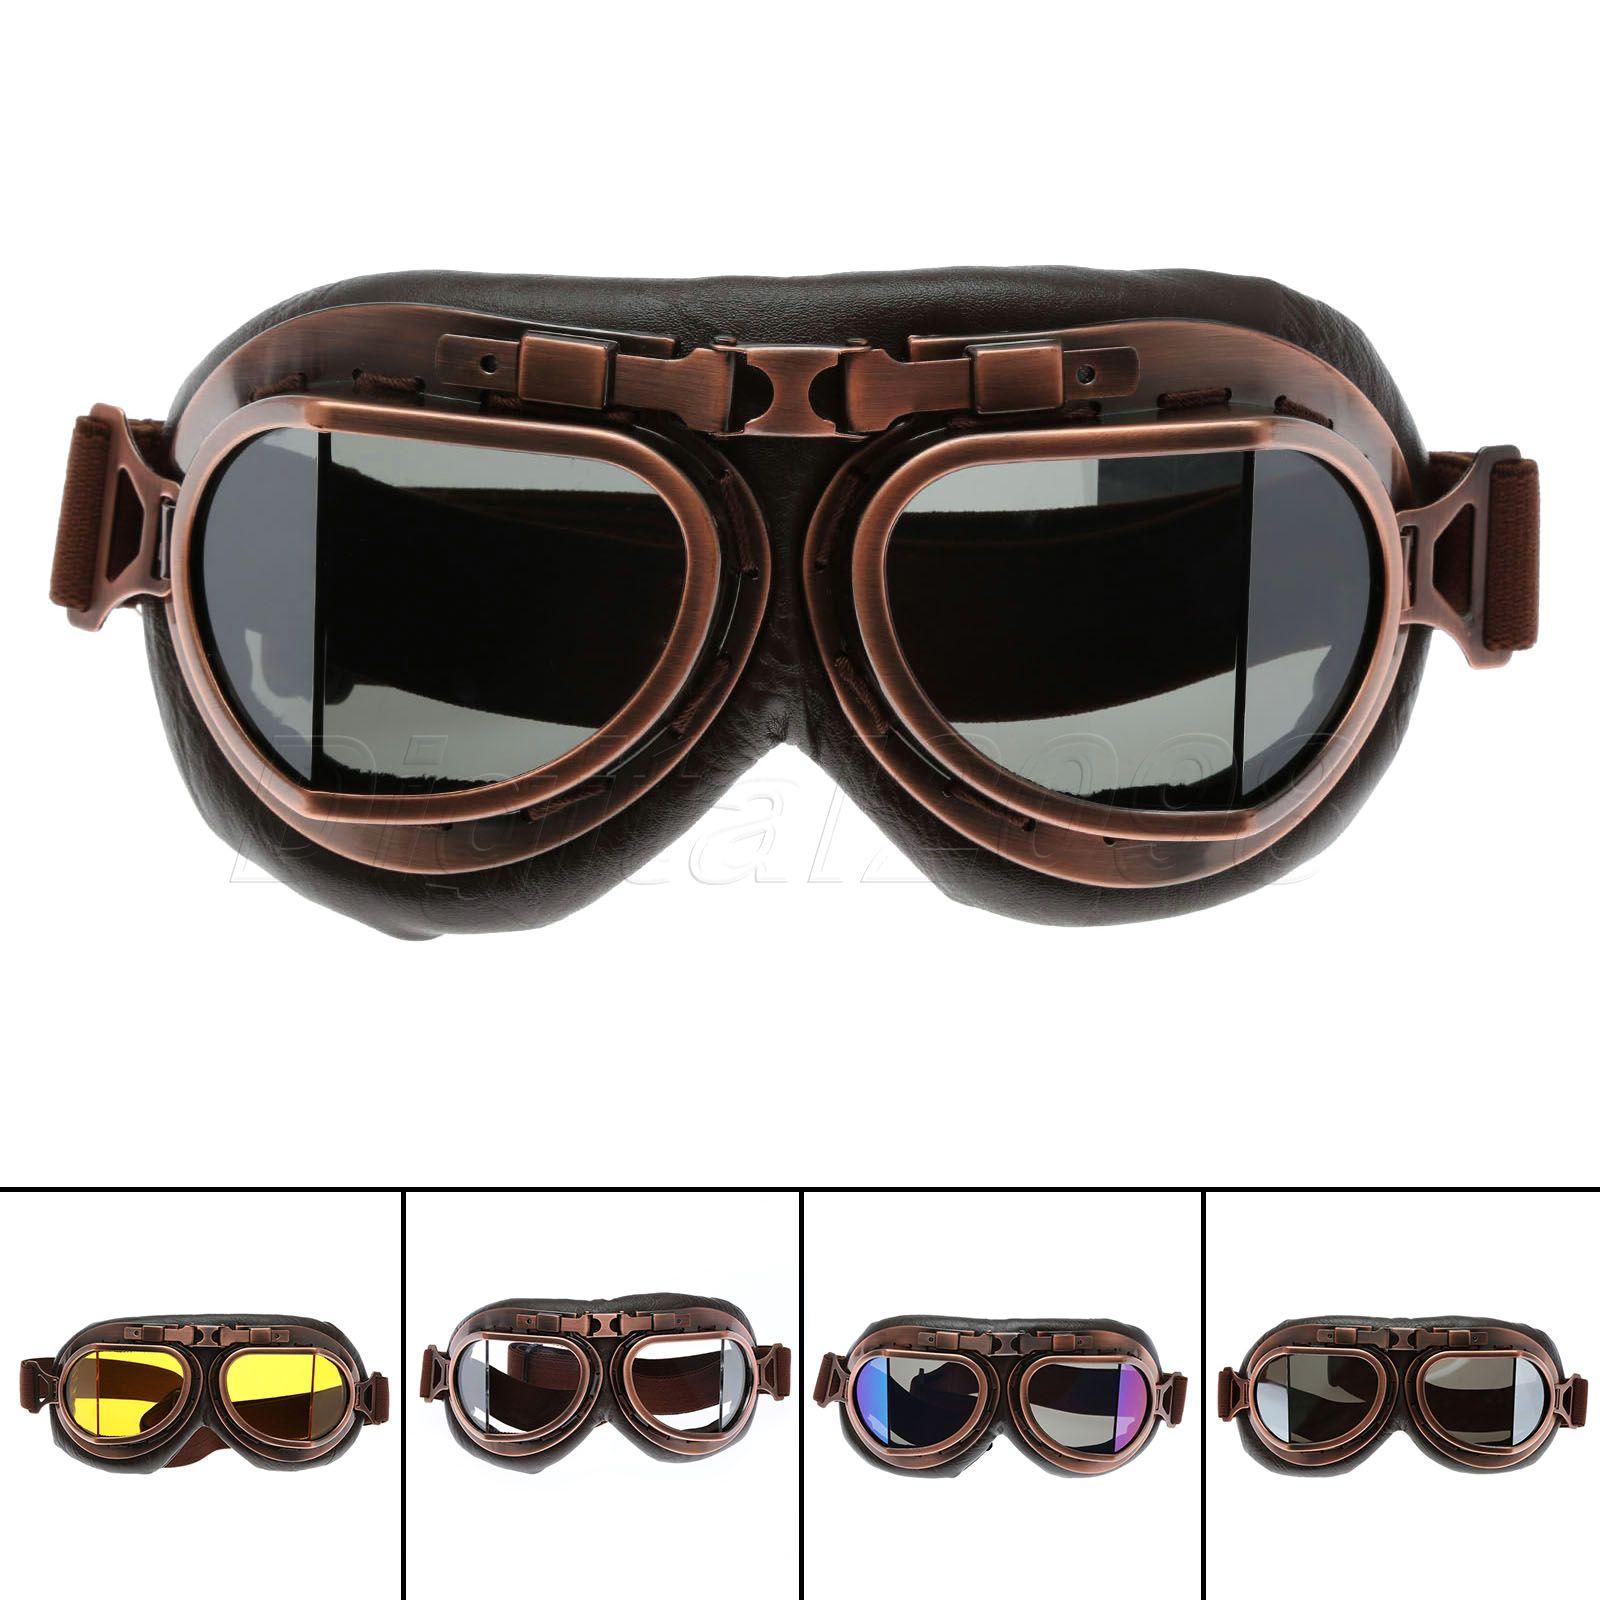 Yetaha WWII RAF Vintage Motorfietsbril Harley Motocross Aviator Pilot - Motoraccessoires en onderdelen